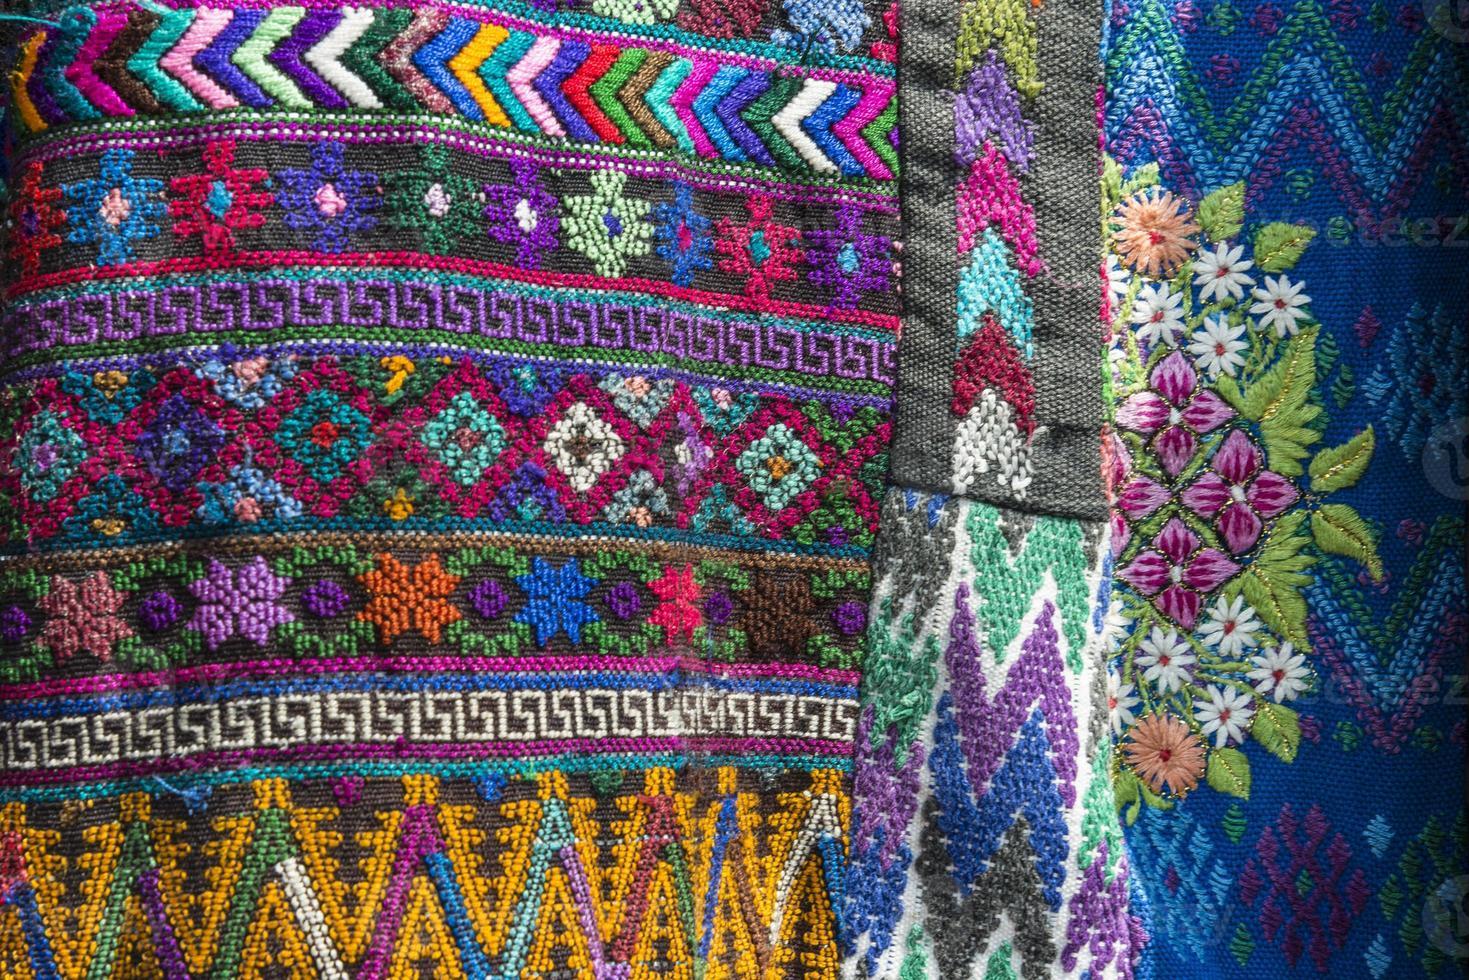 traditionellt handgjort guatemalanskt tyg foto